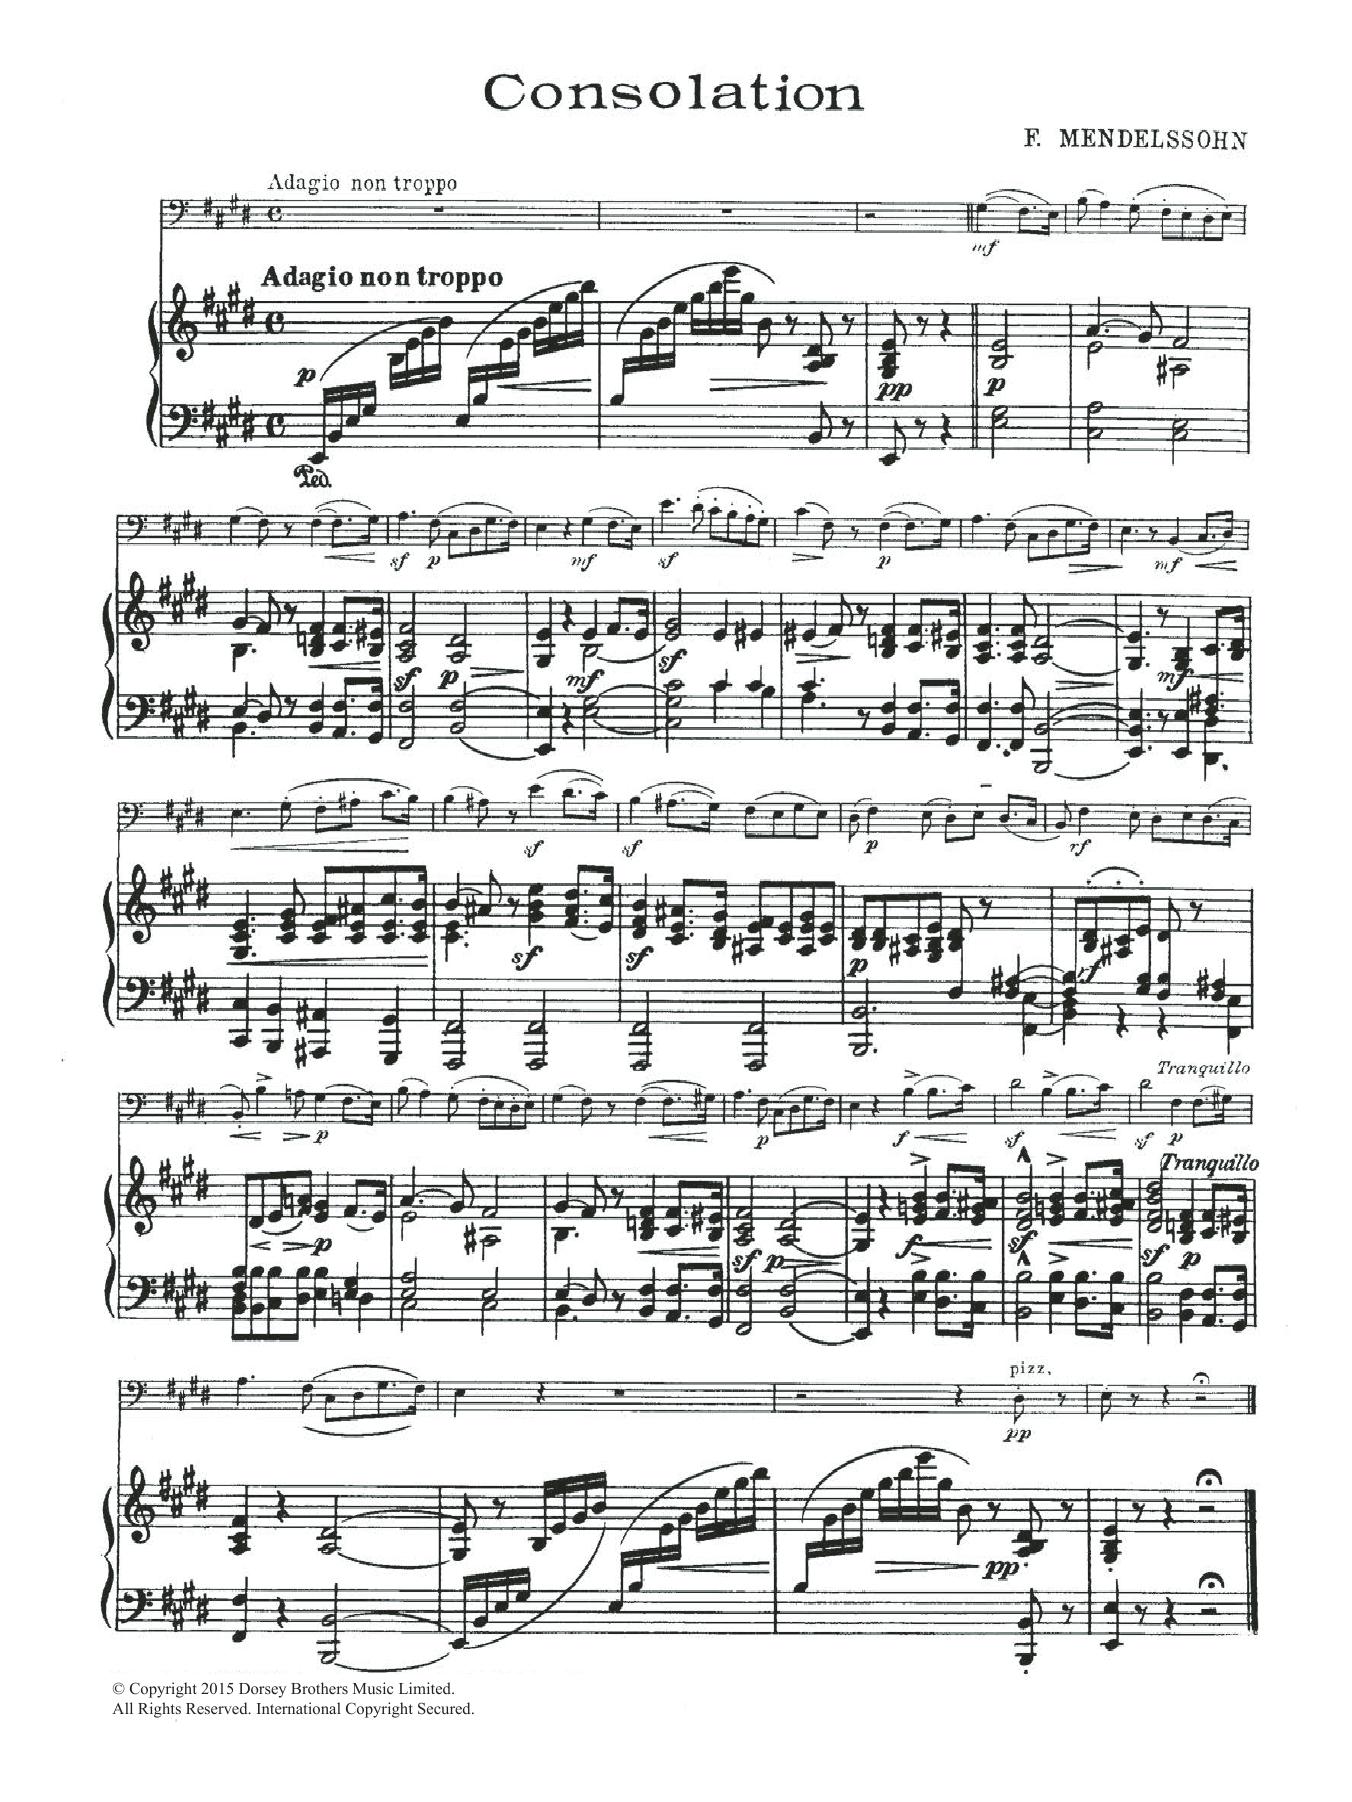 Felix Mendelssohn: Consolation